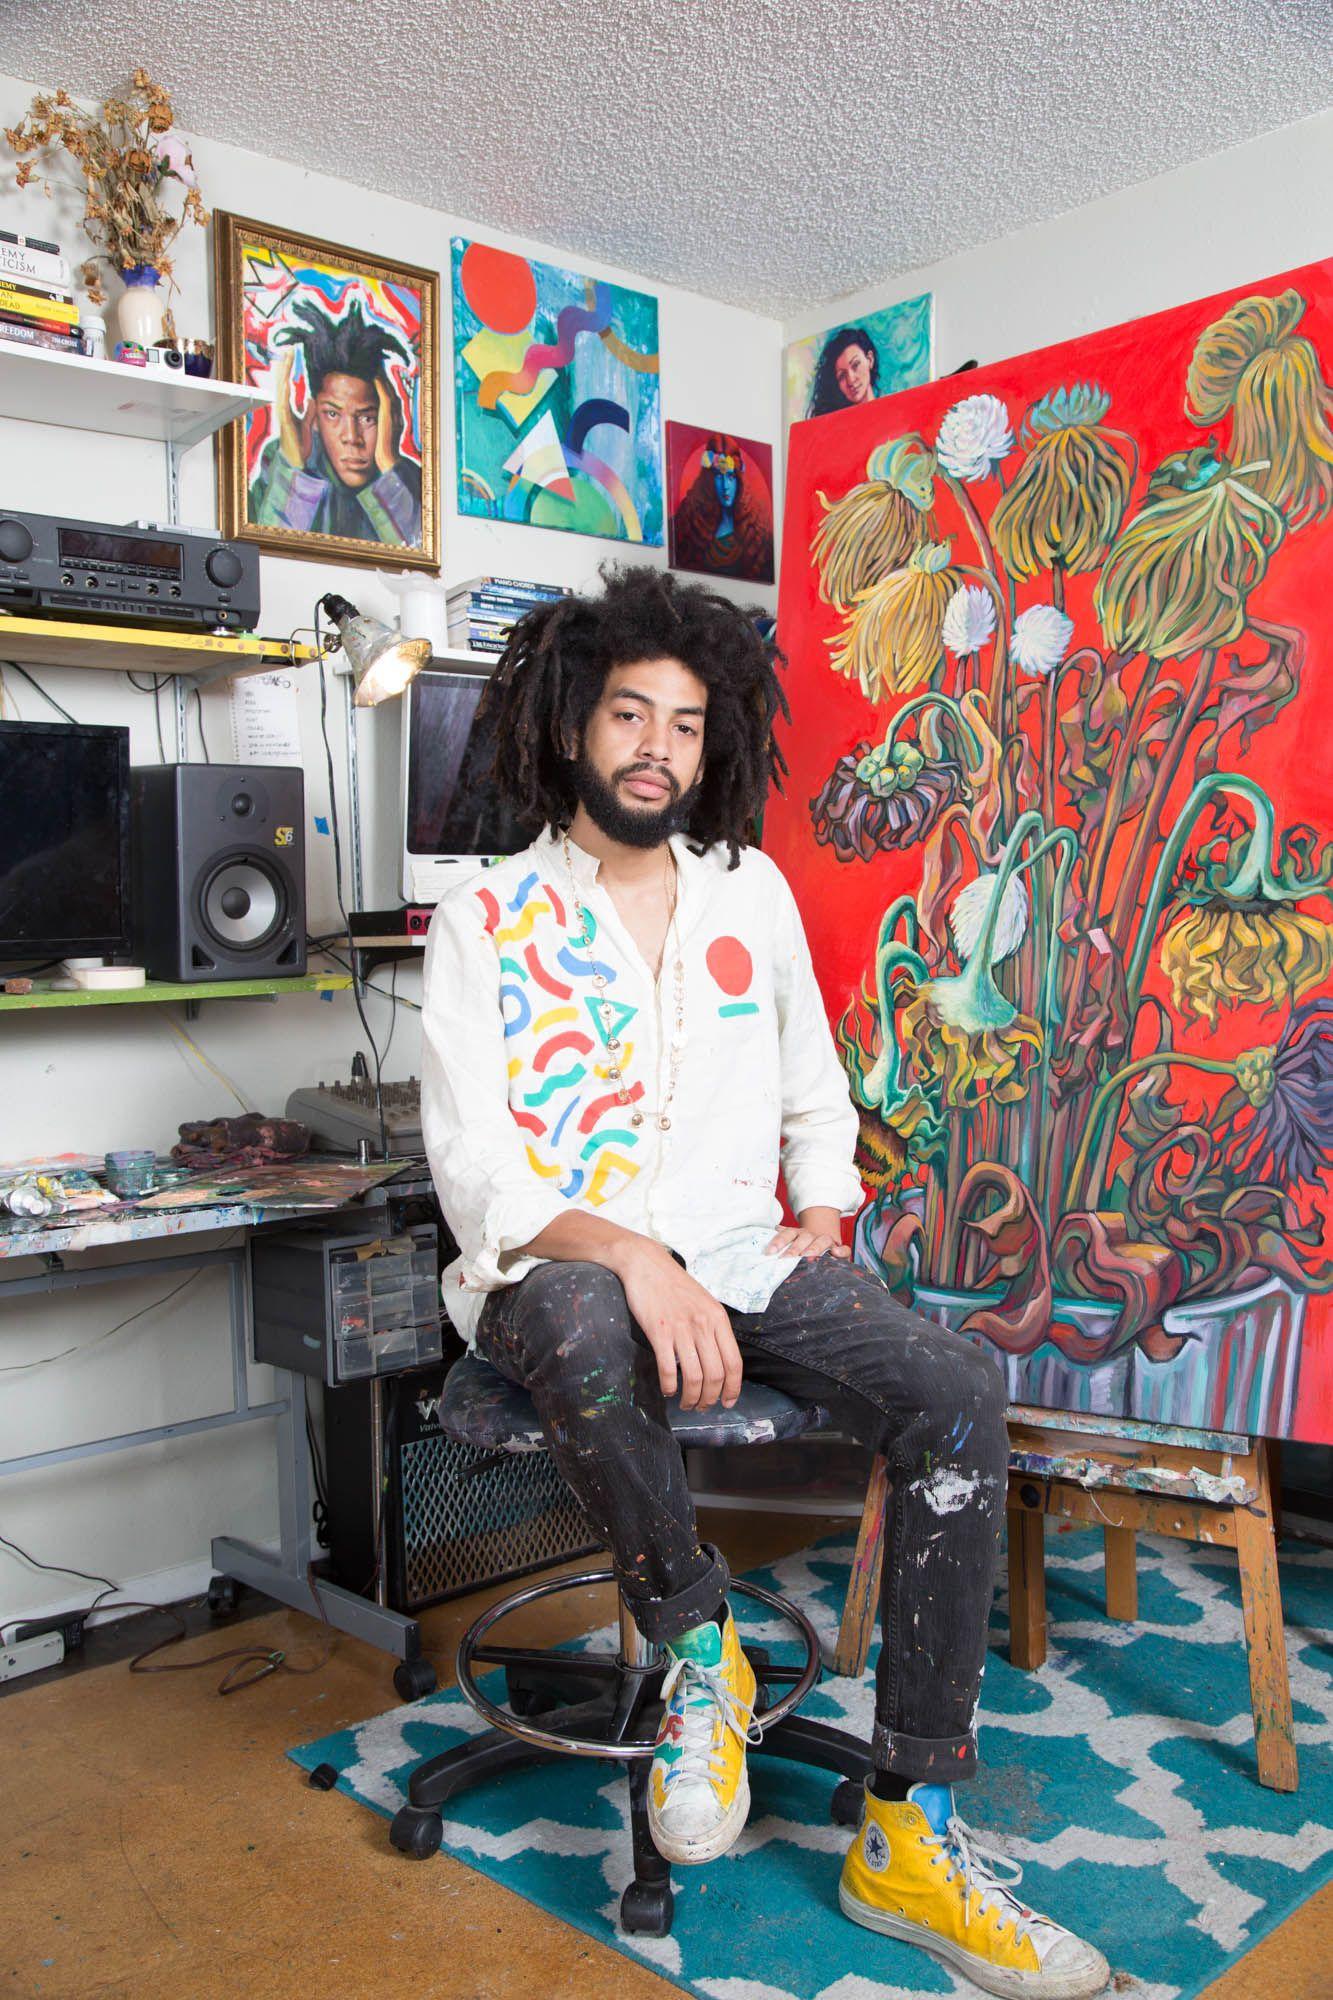 Austin artist Rex Hamilton shares his favorite things